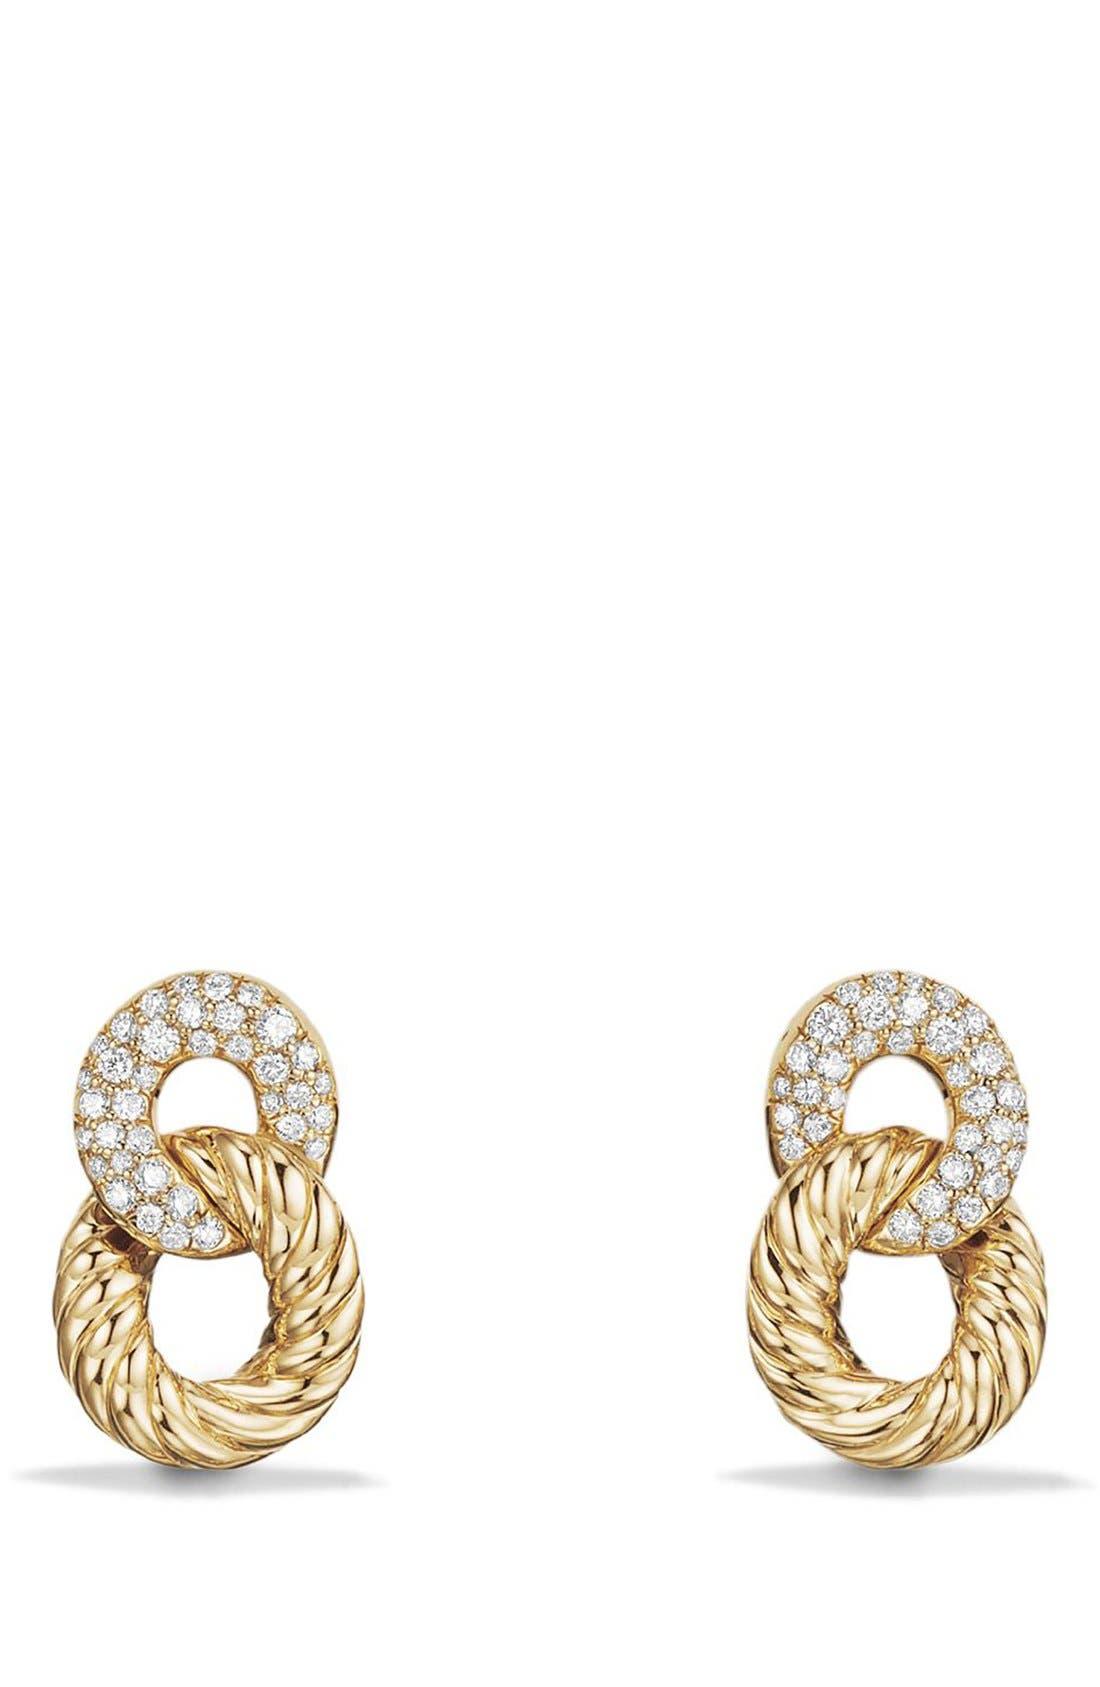 DAVID YURMAN Extra-Small Curb Link Drop Earrings with Diamond in 18K Gold